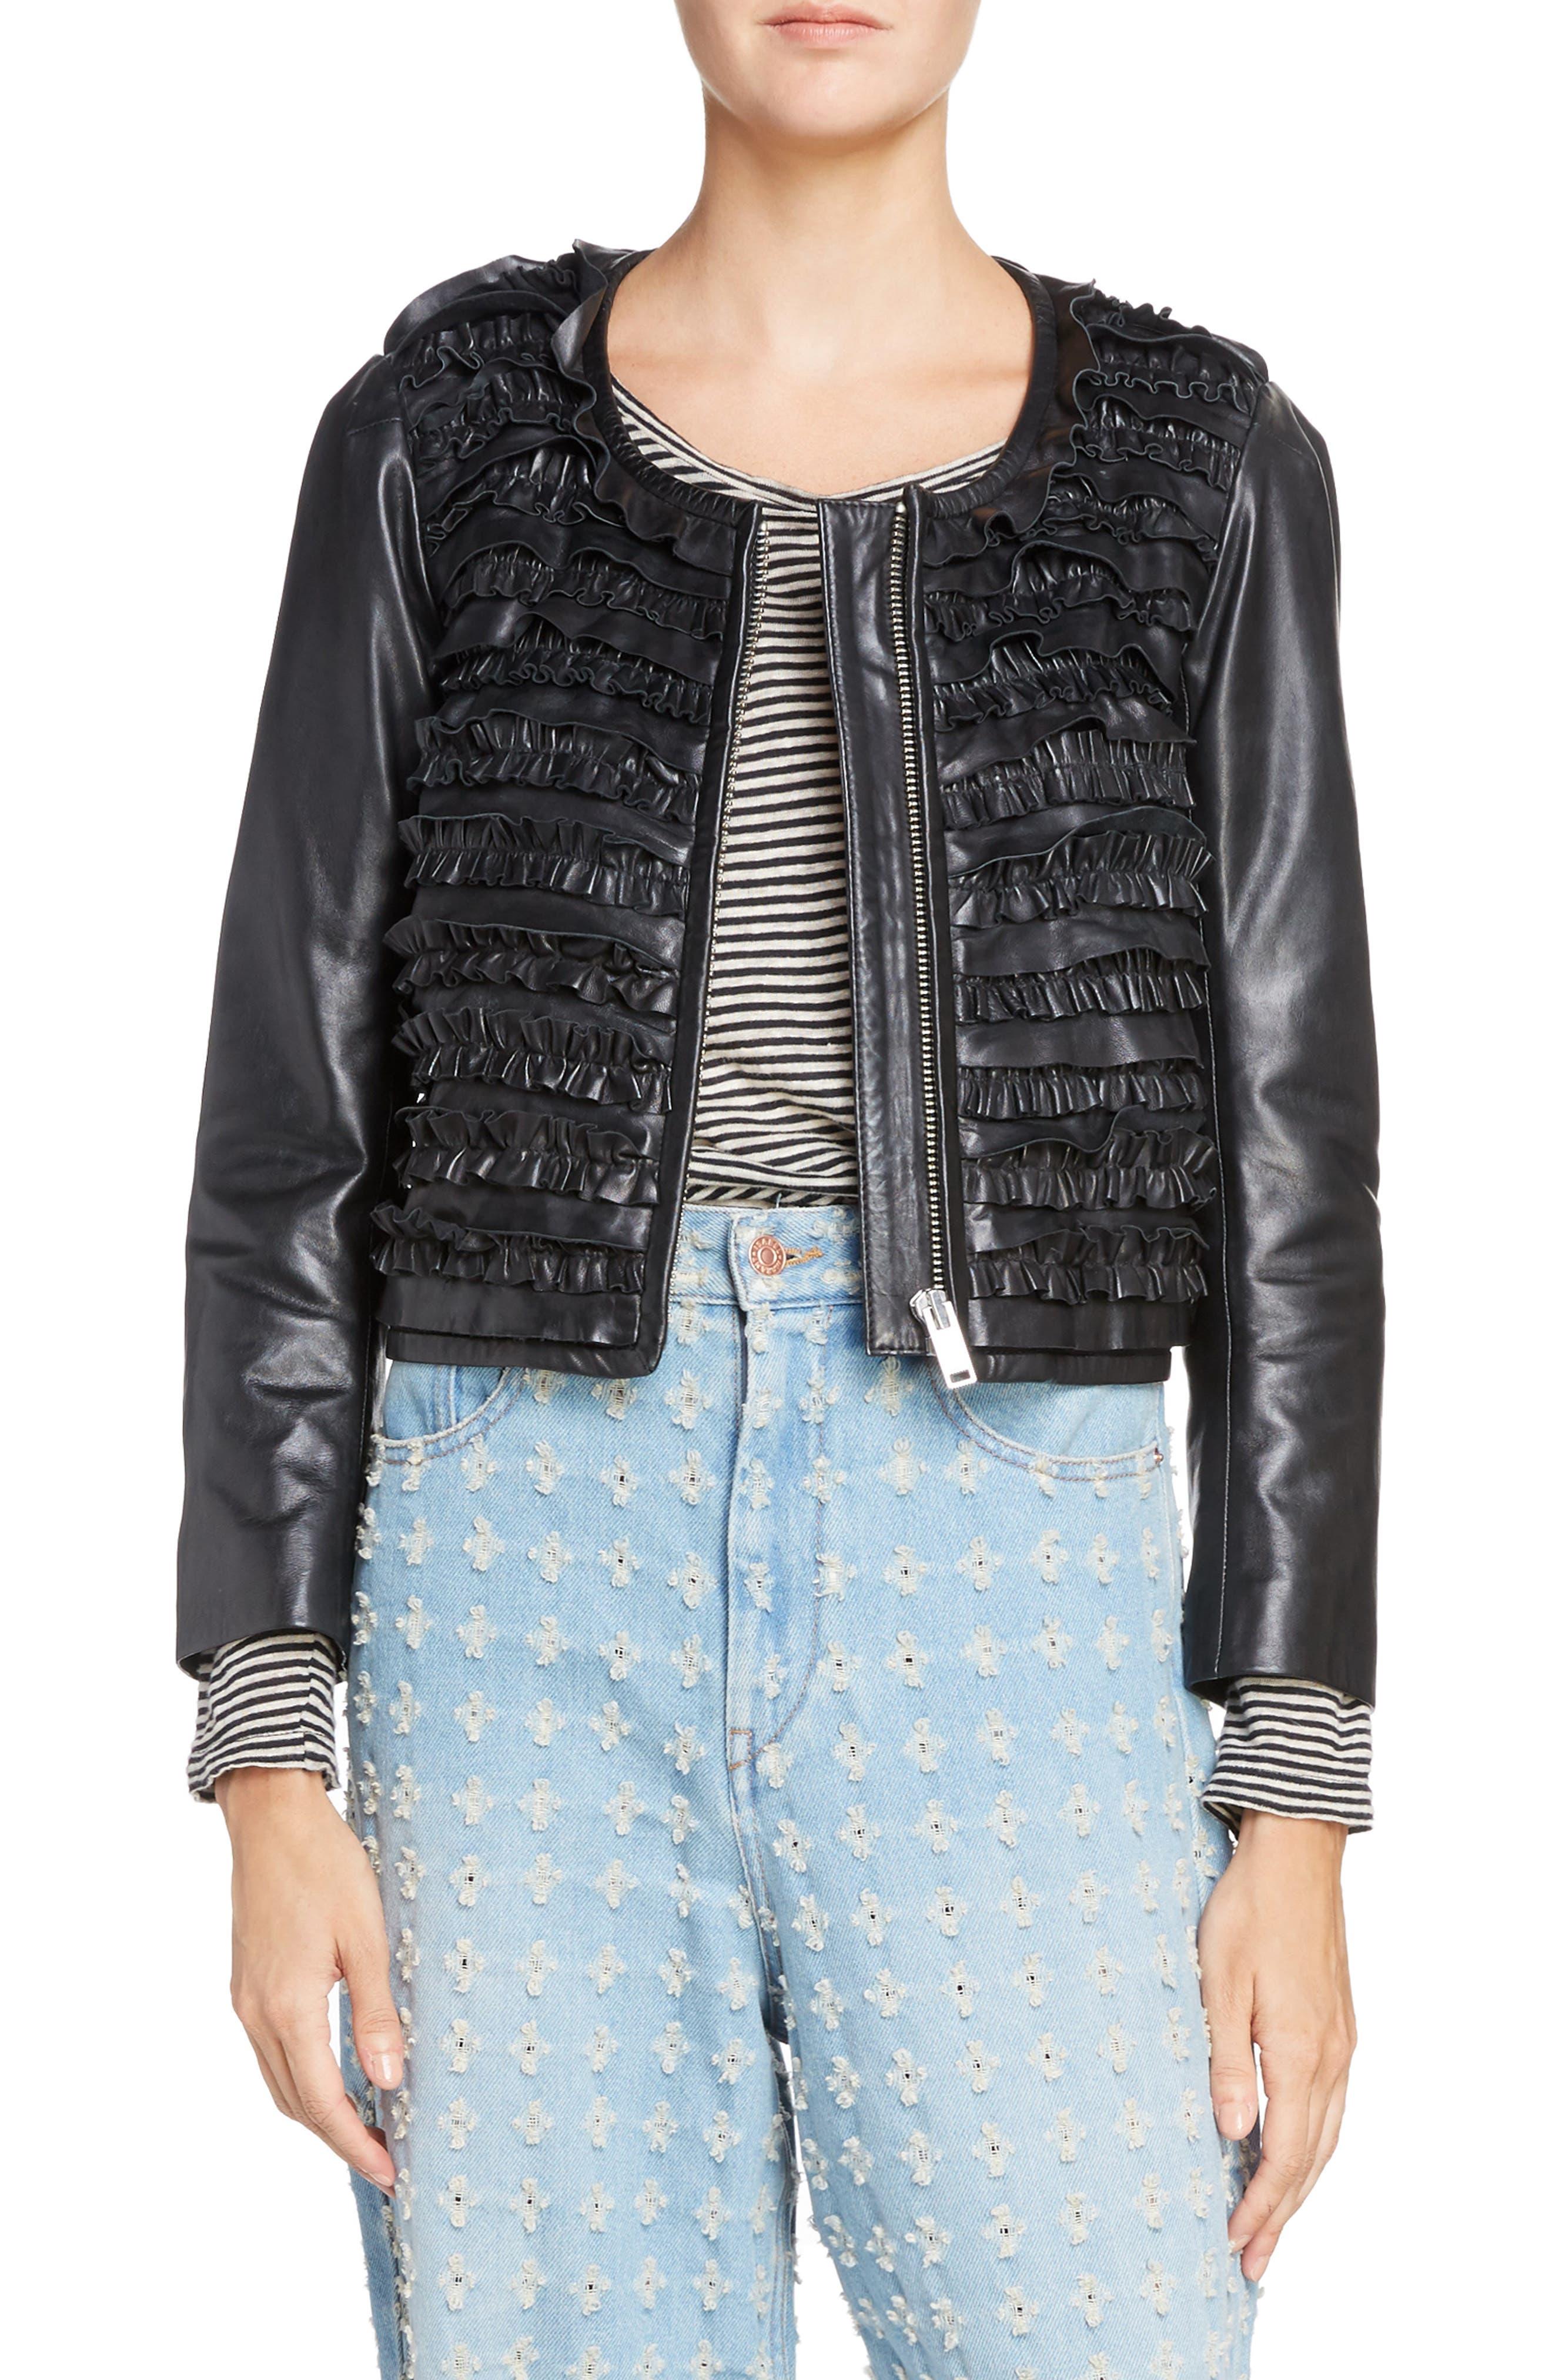 Isabel Marant Étoile Abella Frill Leather Jacket,                         Main,                         color, Black